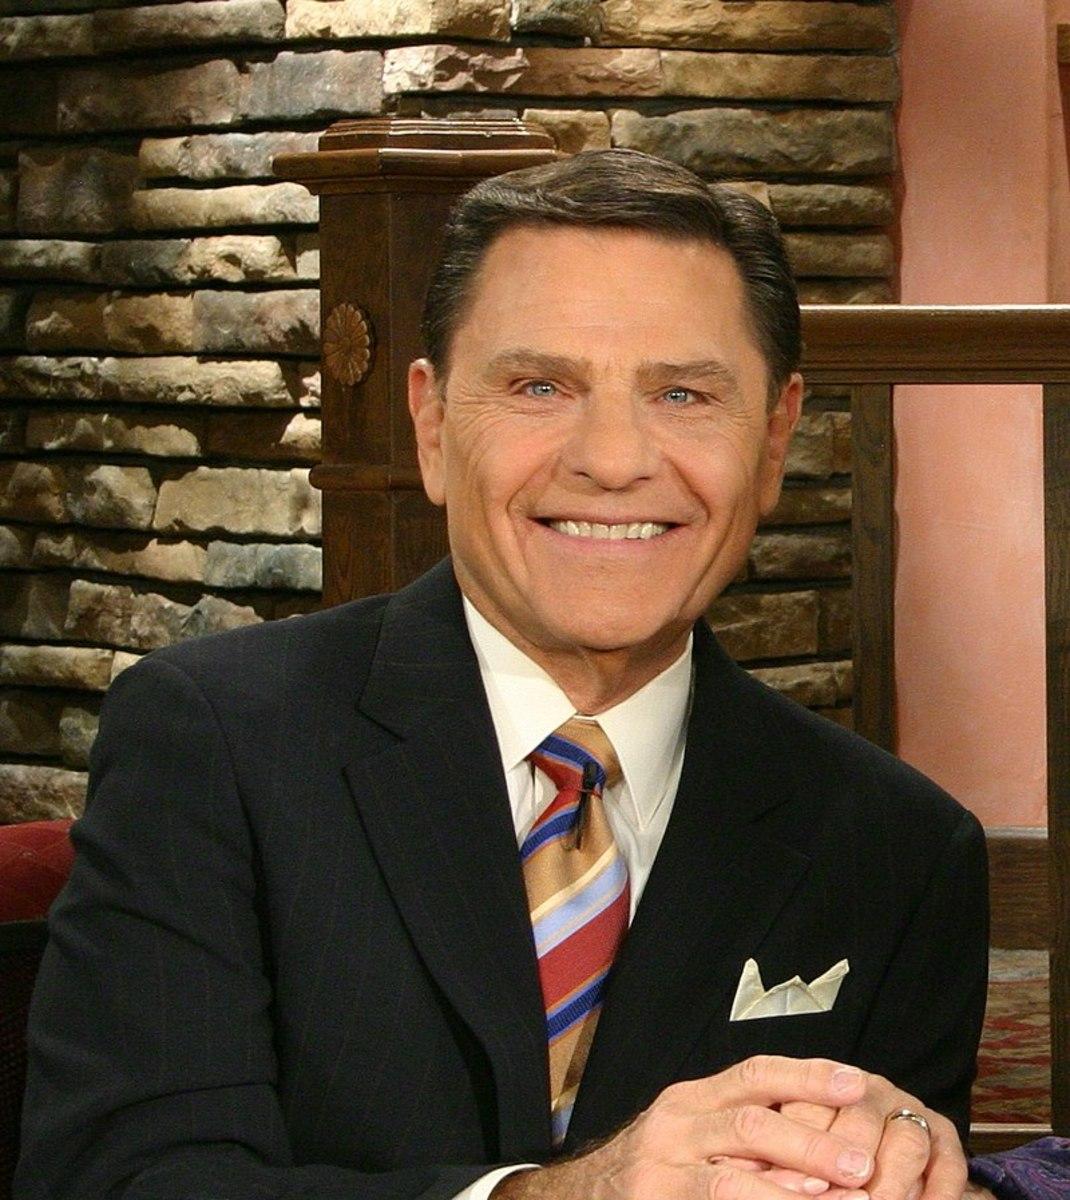 Kenneth Copeland: the Prosperous Pastor